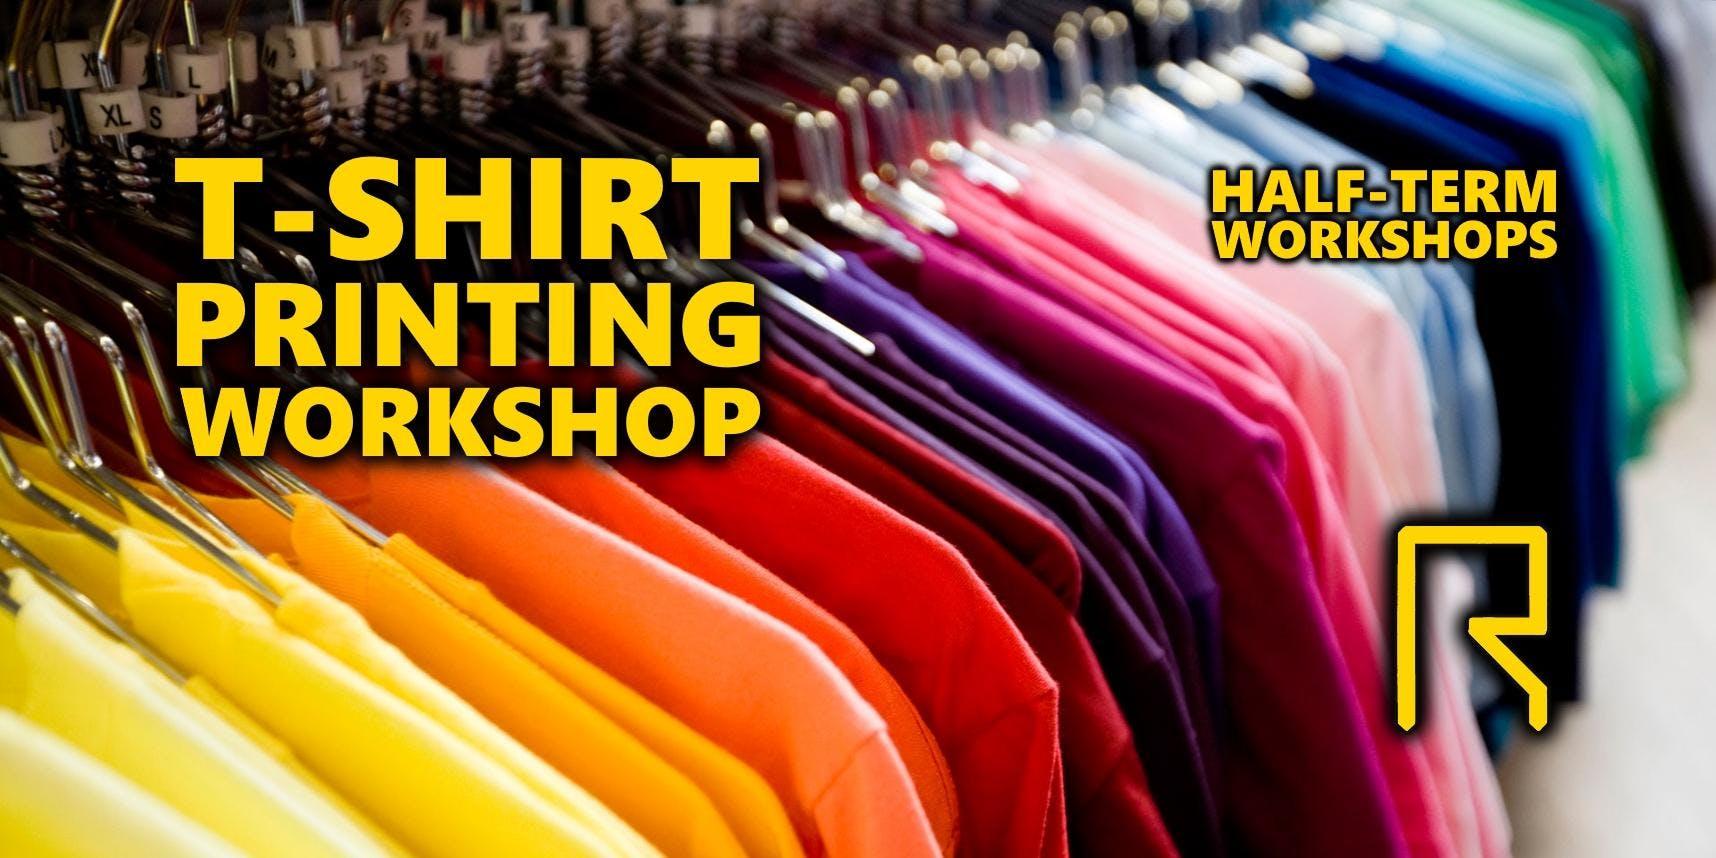 T-shirt Printing Workshop